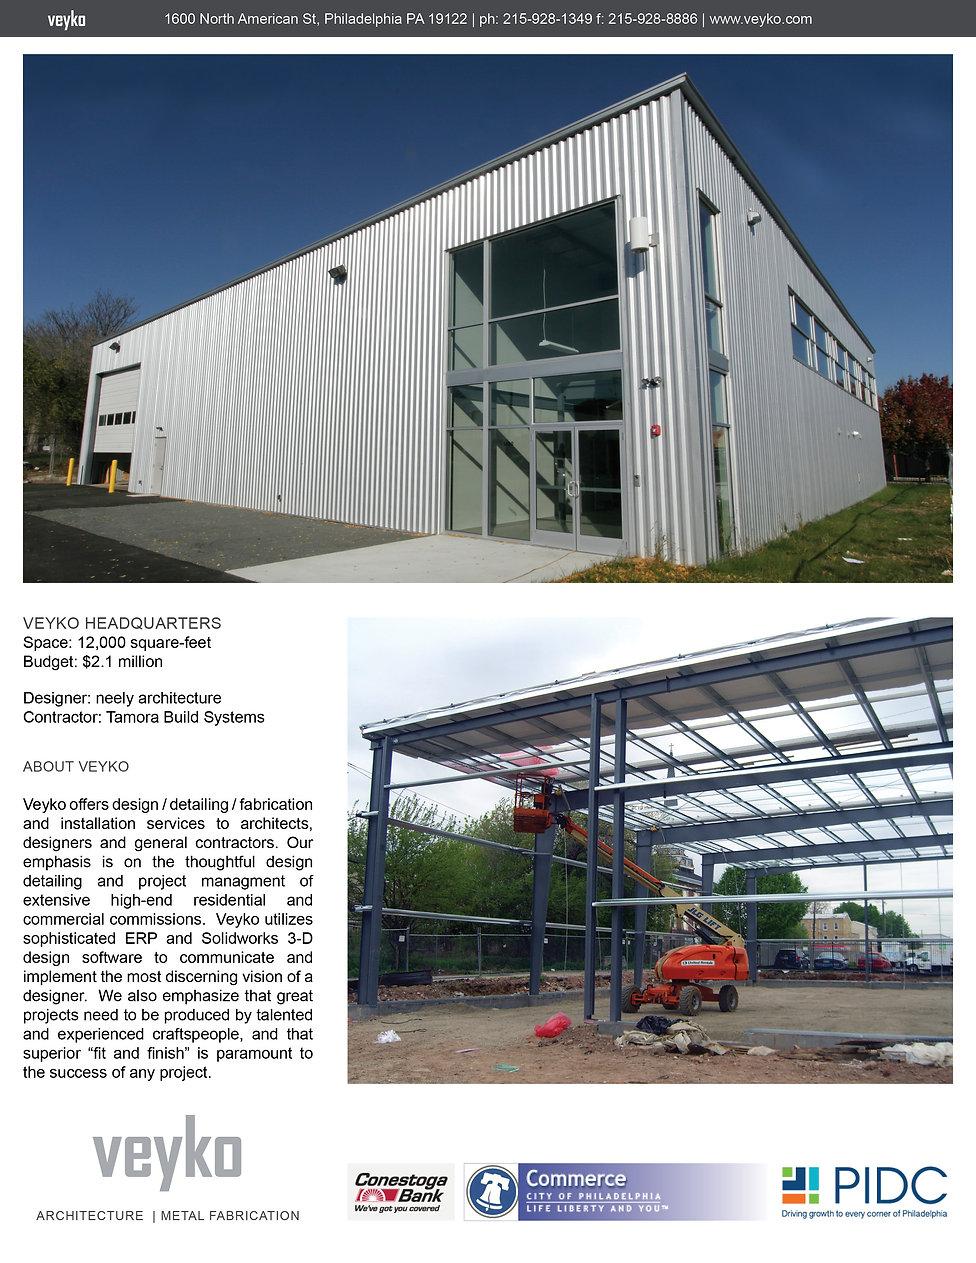 Issue 11 Veyko Building p1.jpg